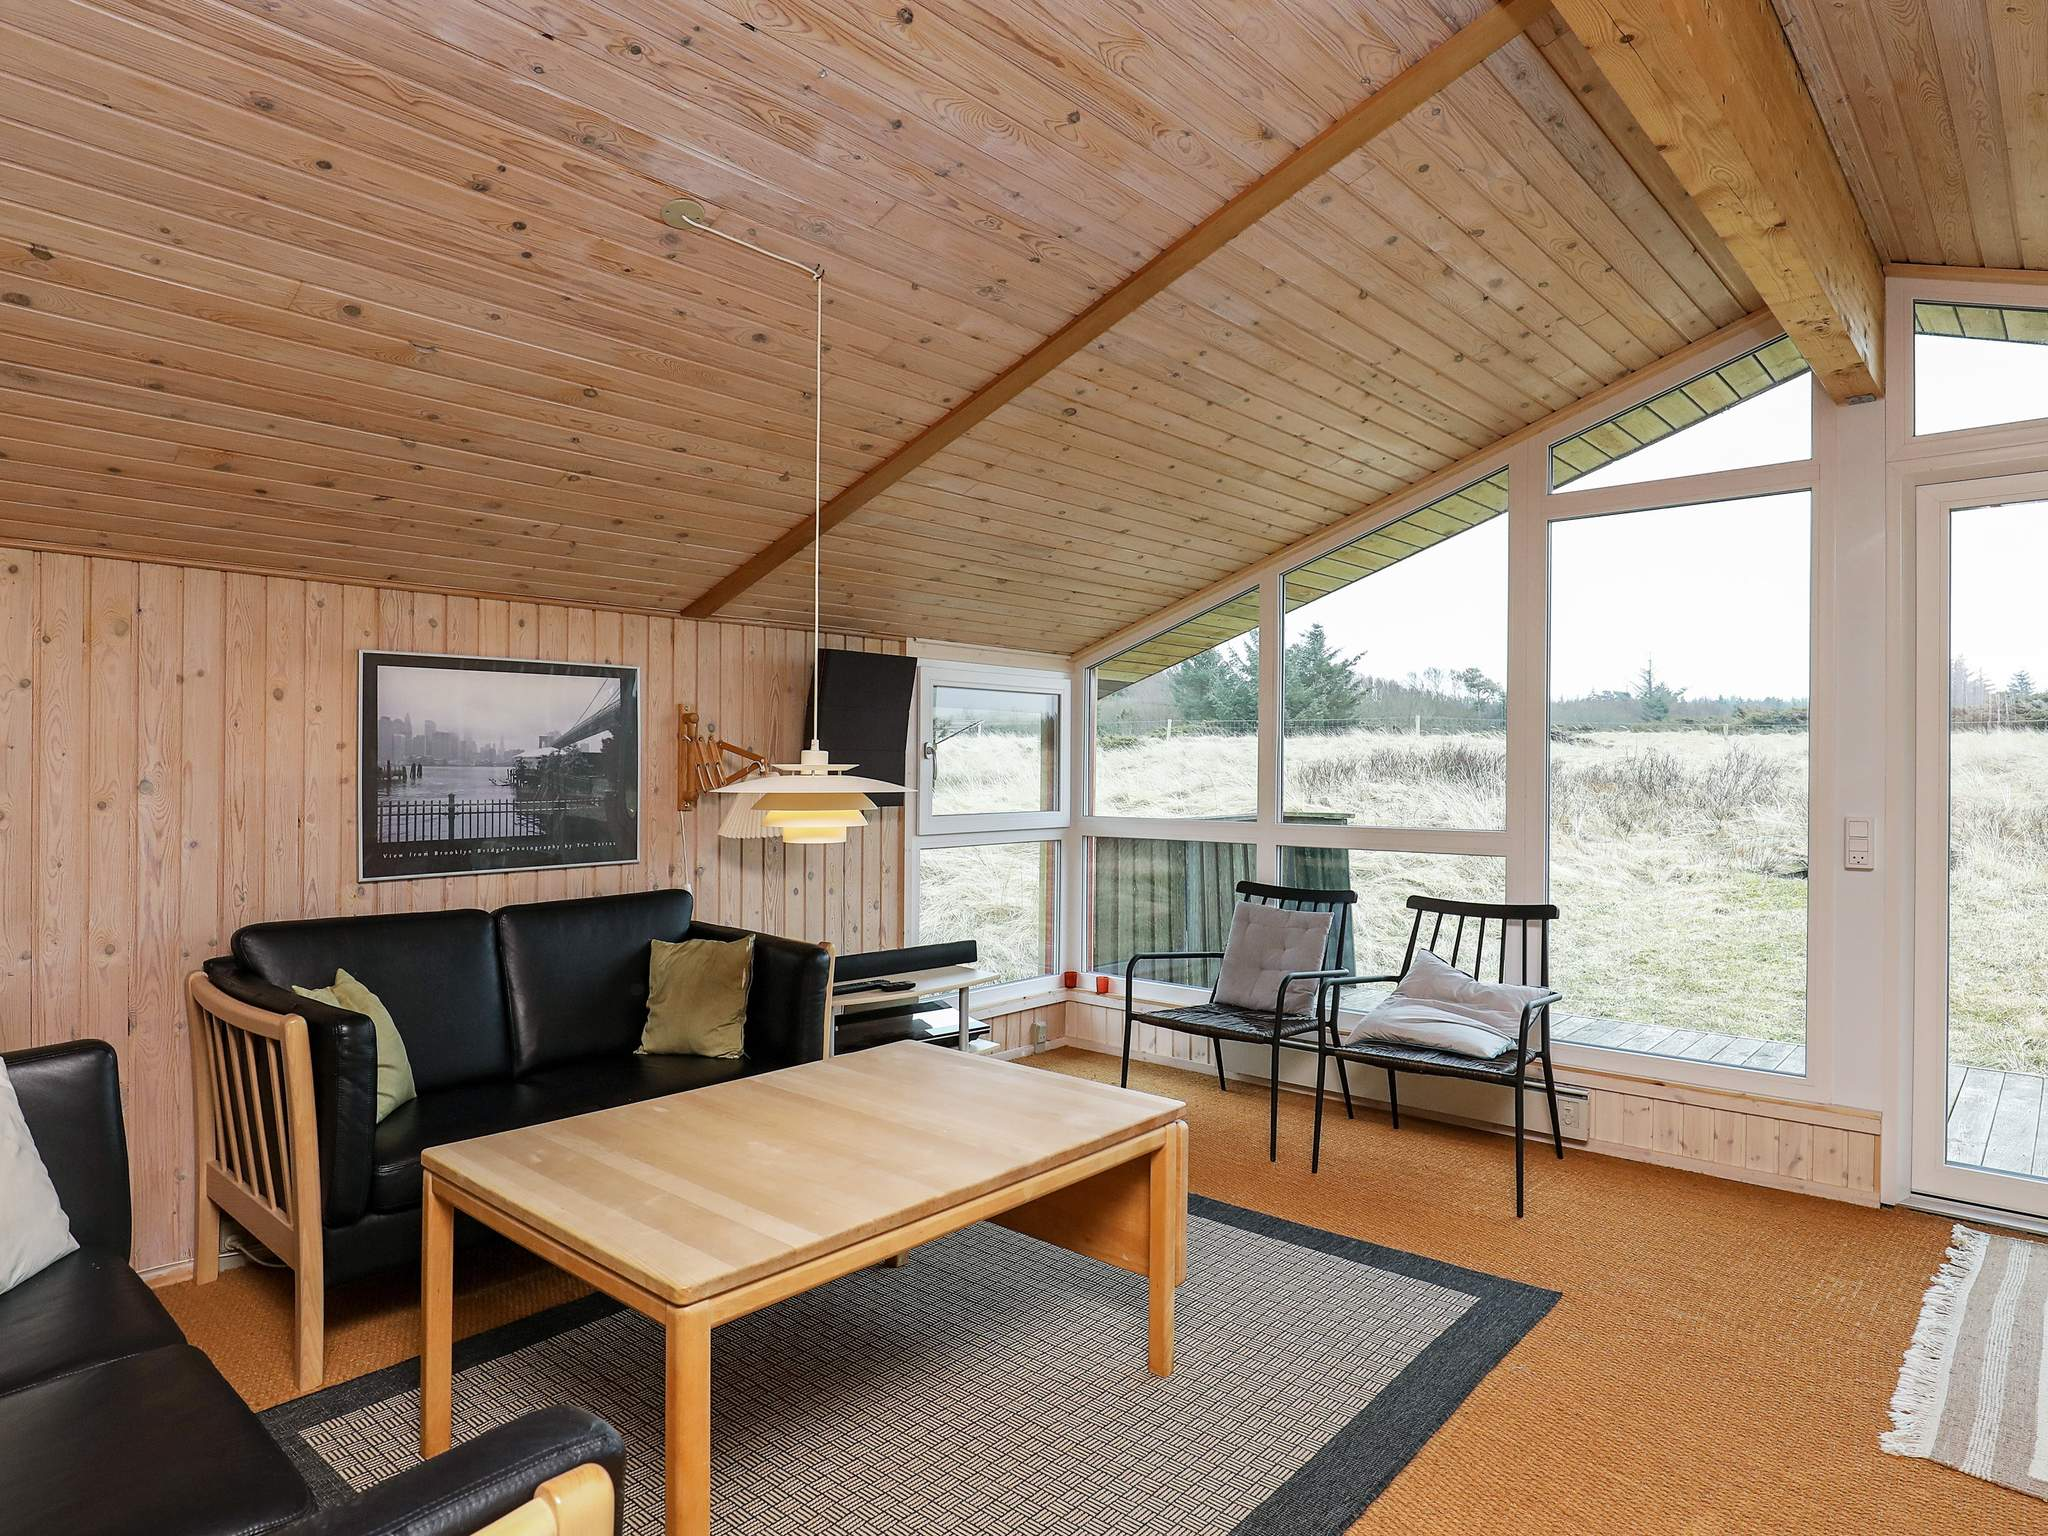 Ferienhaus Kjul Strand (319409), Hirtshals, , Dänische Nordsee, Dänemark, Bild 3